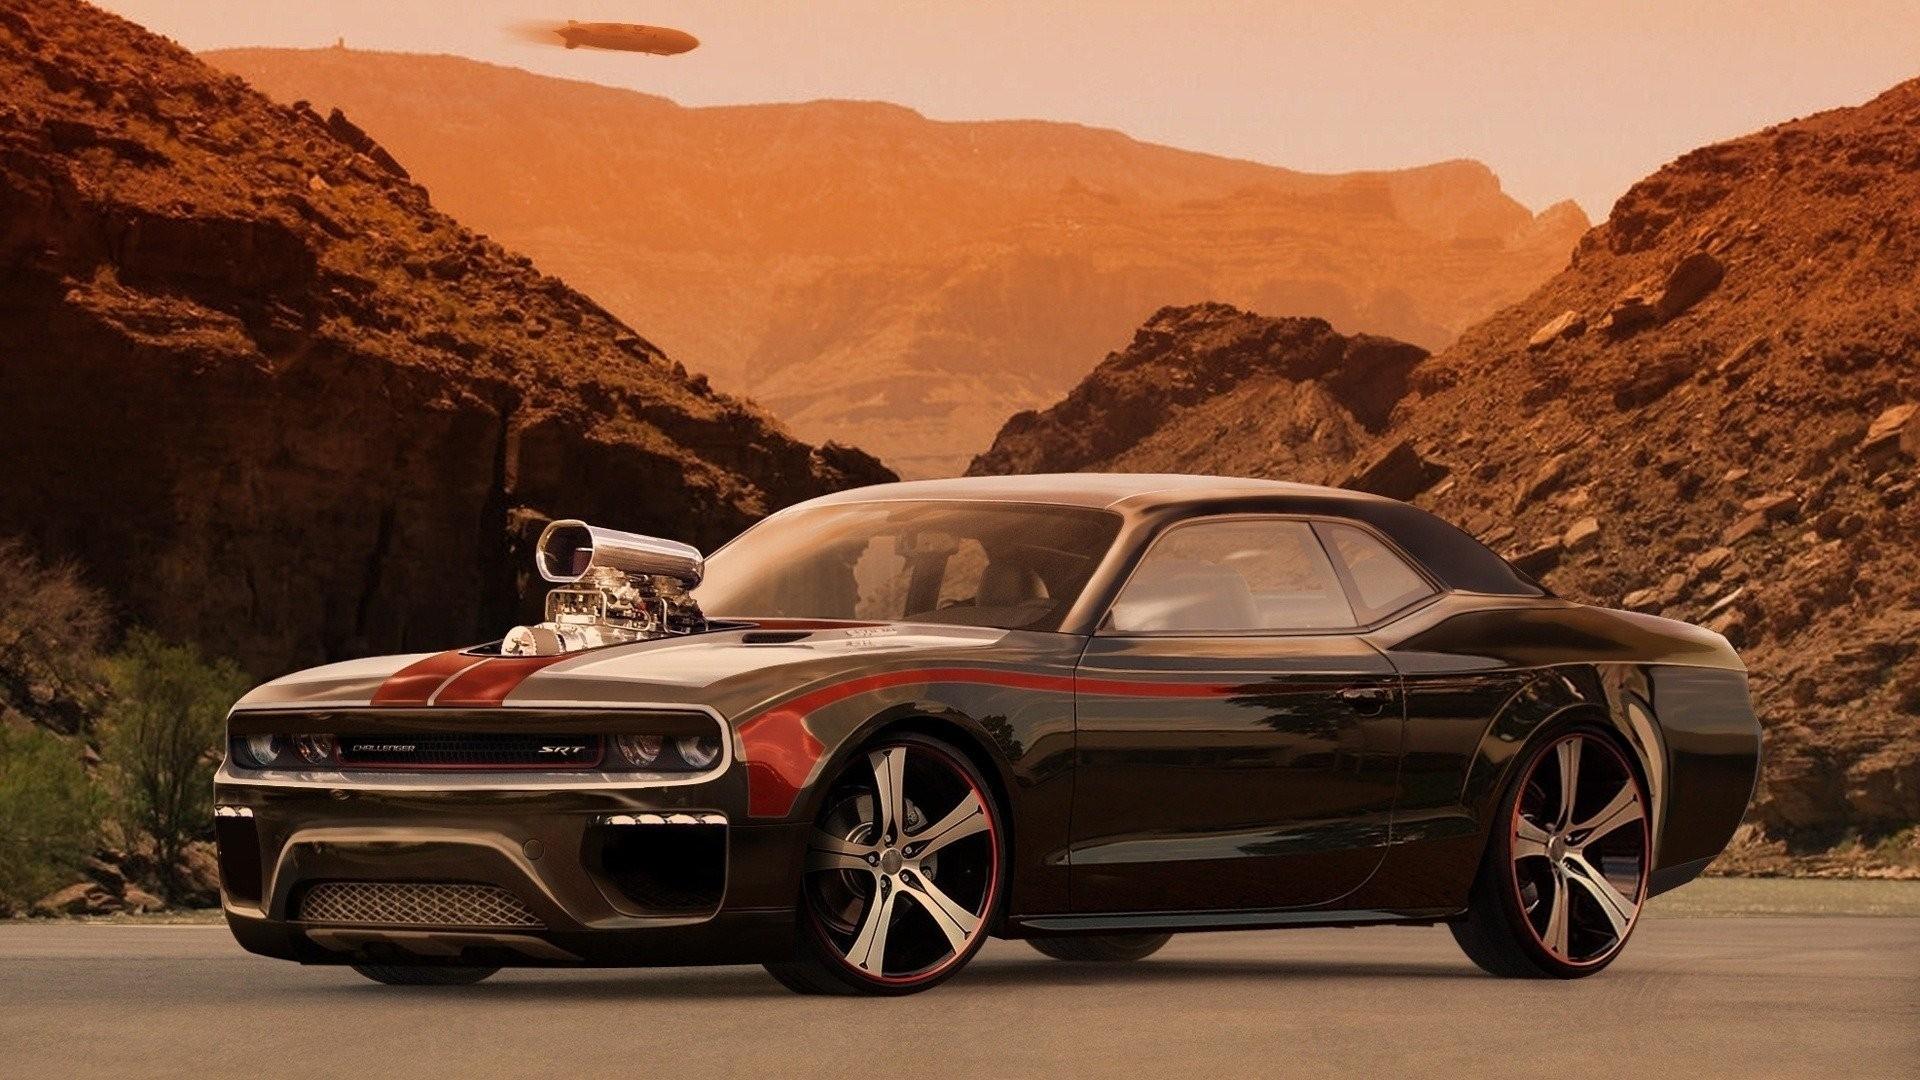 cool muscle car wallpaper. - media file | pixelstalk